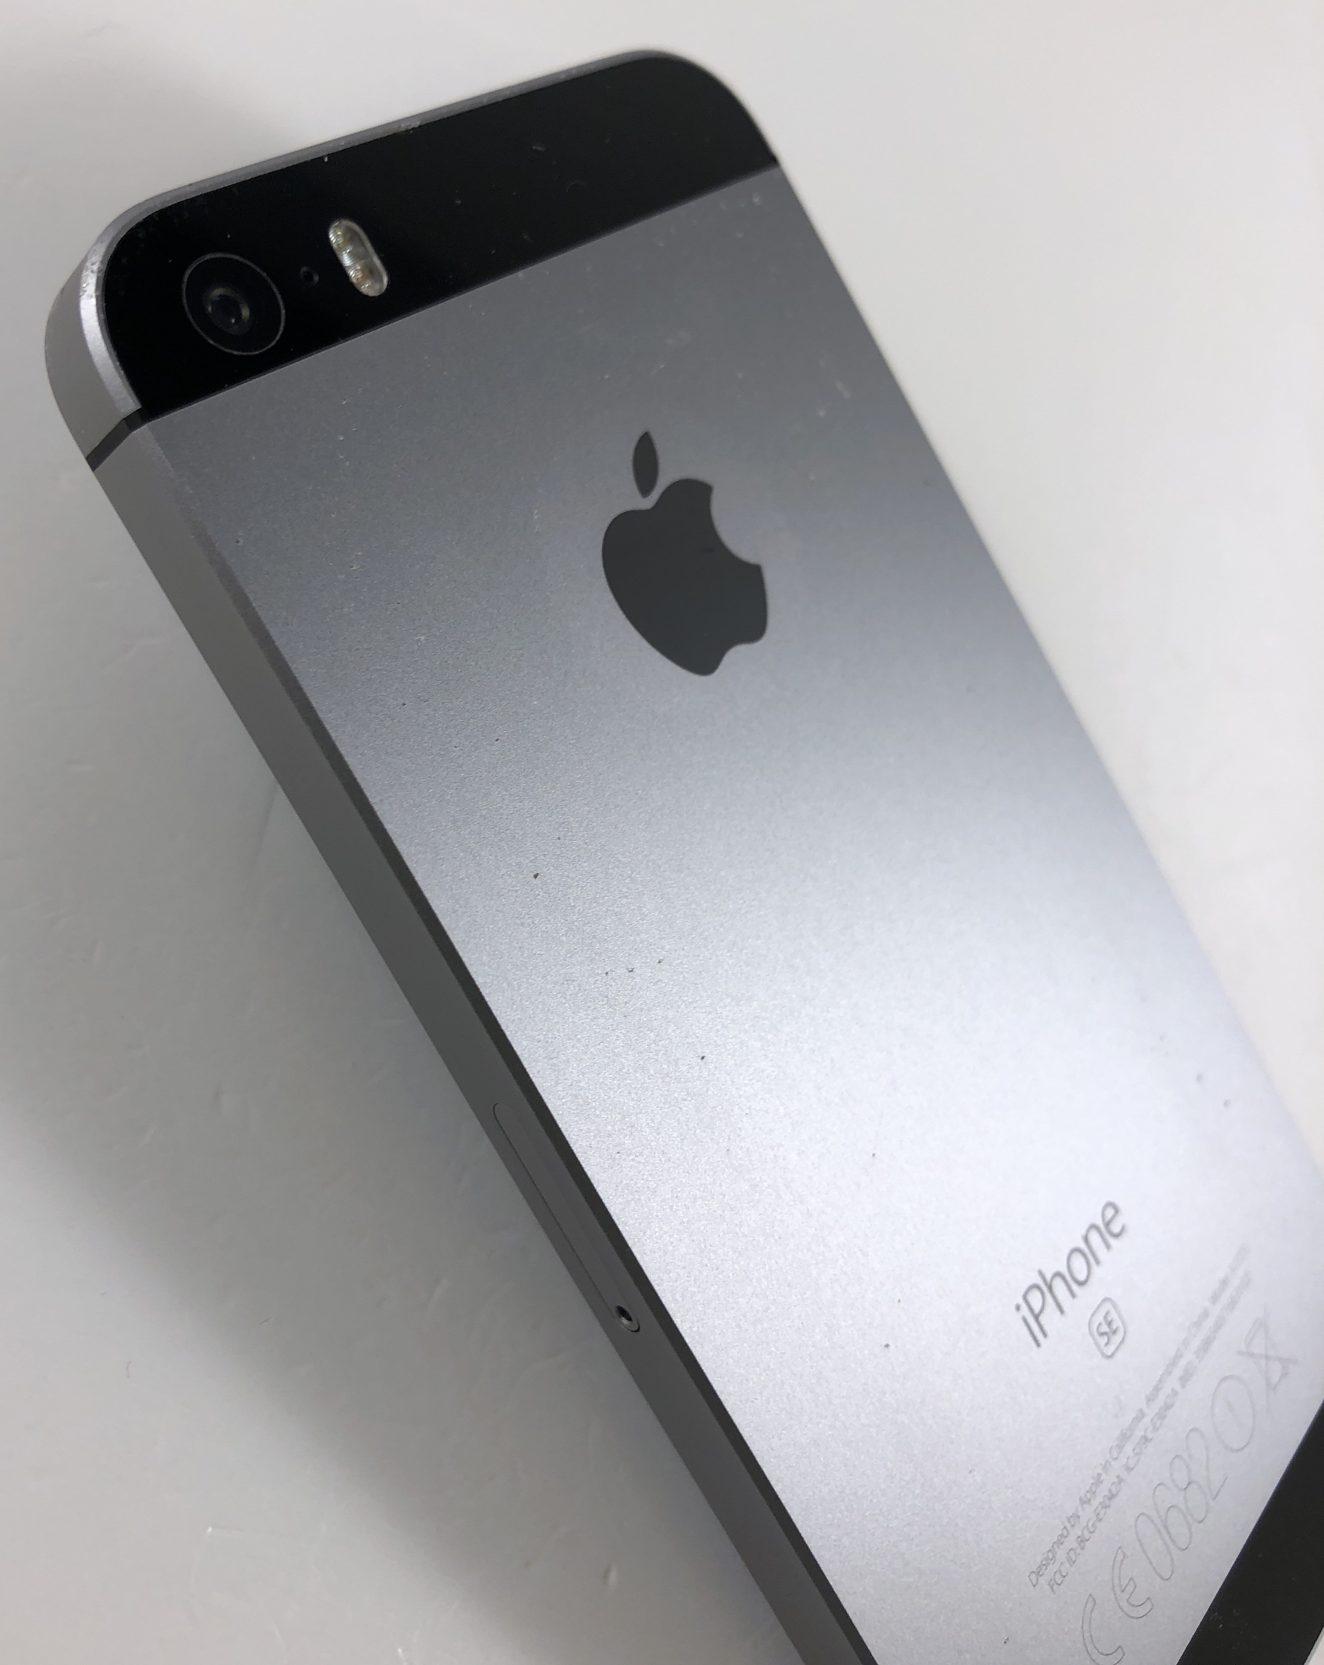 iPhone SE 16GB, 16GB, Space Gray, imagen 3